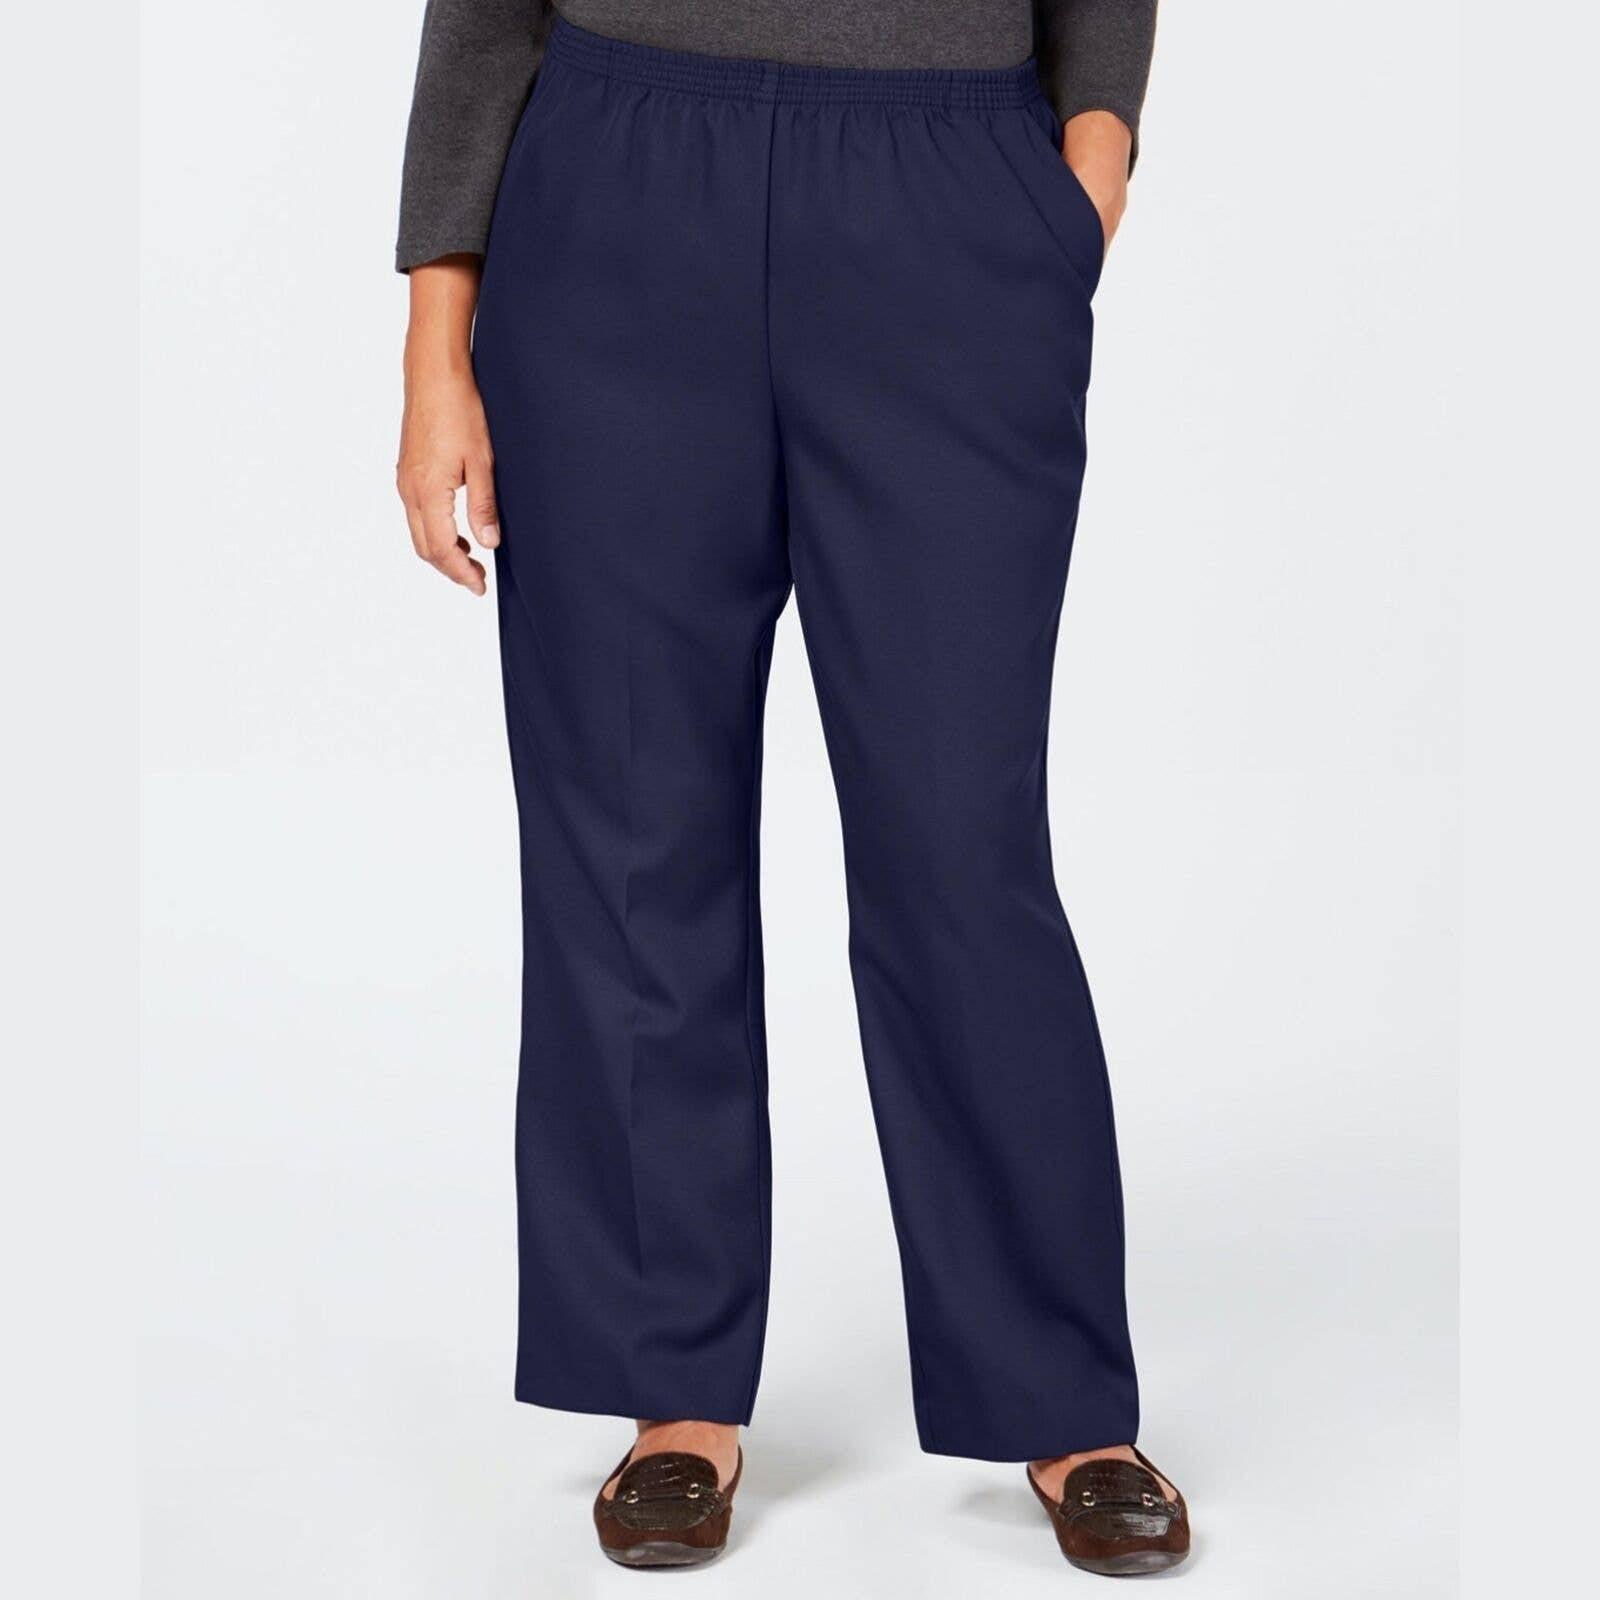 Karen Scott Pants Straight Leg Blue 2X